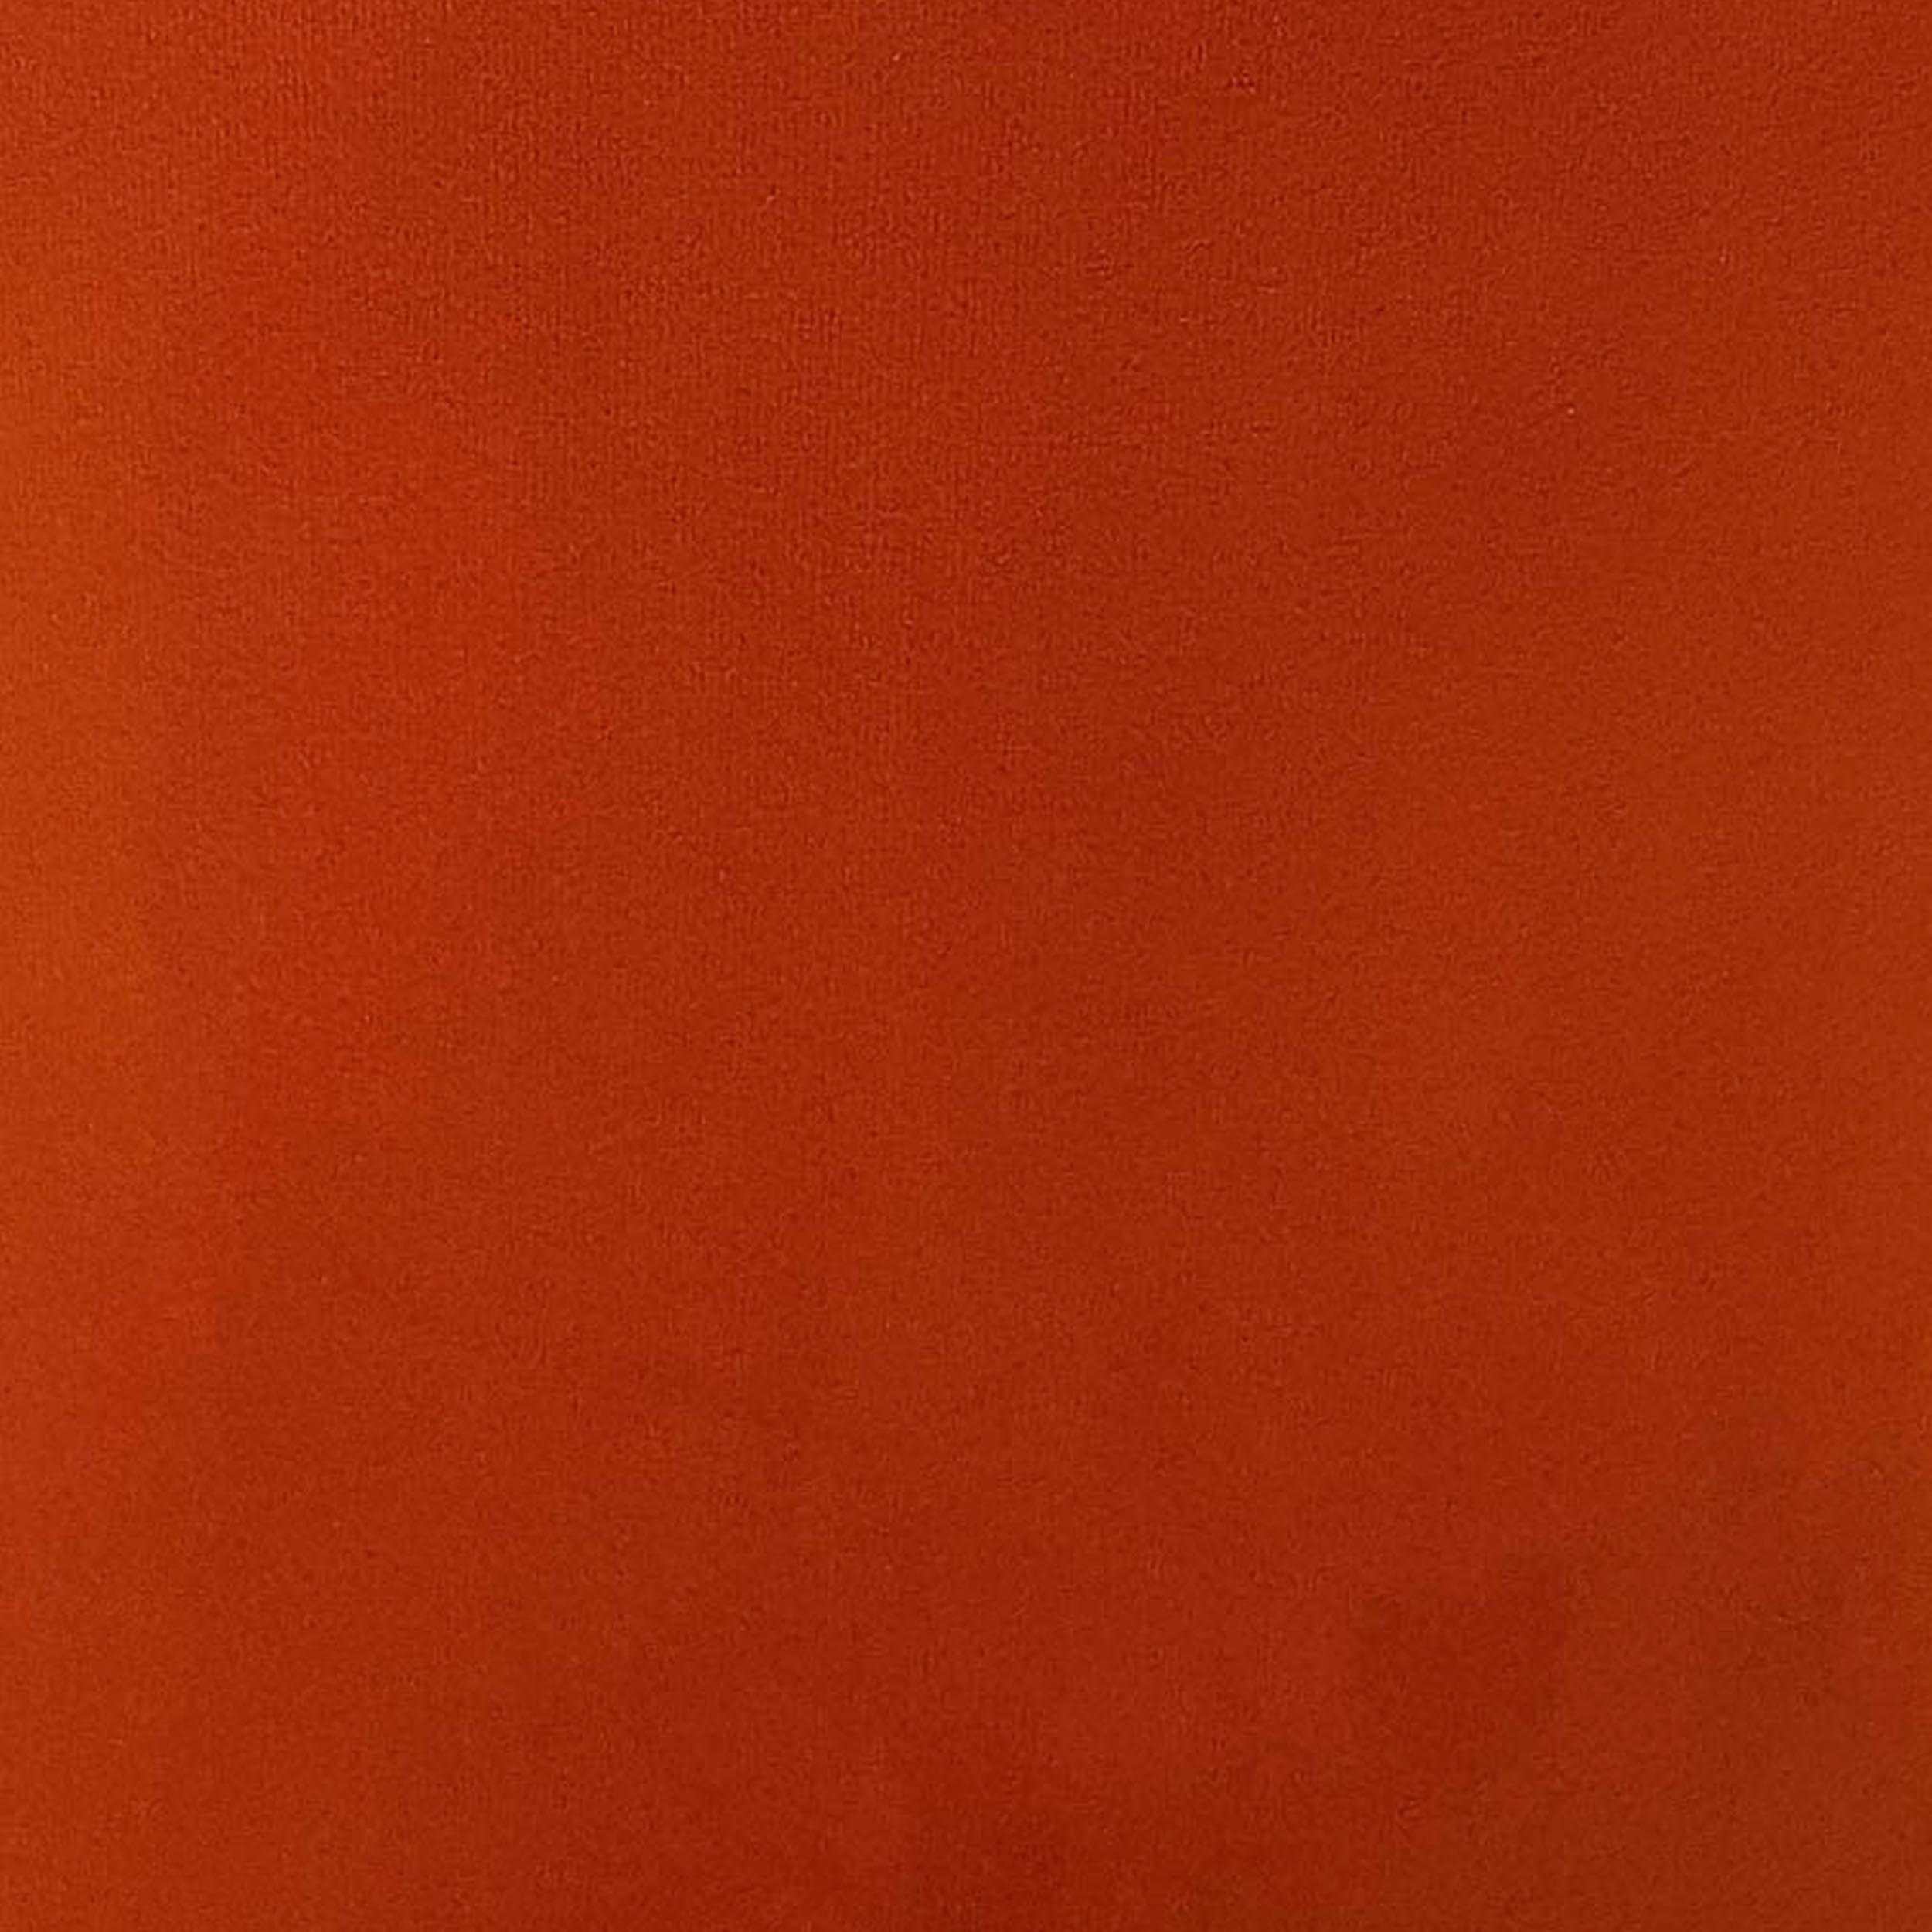 Burnt Orange Velvet Fabric to Purchase by the Metre